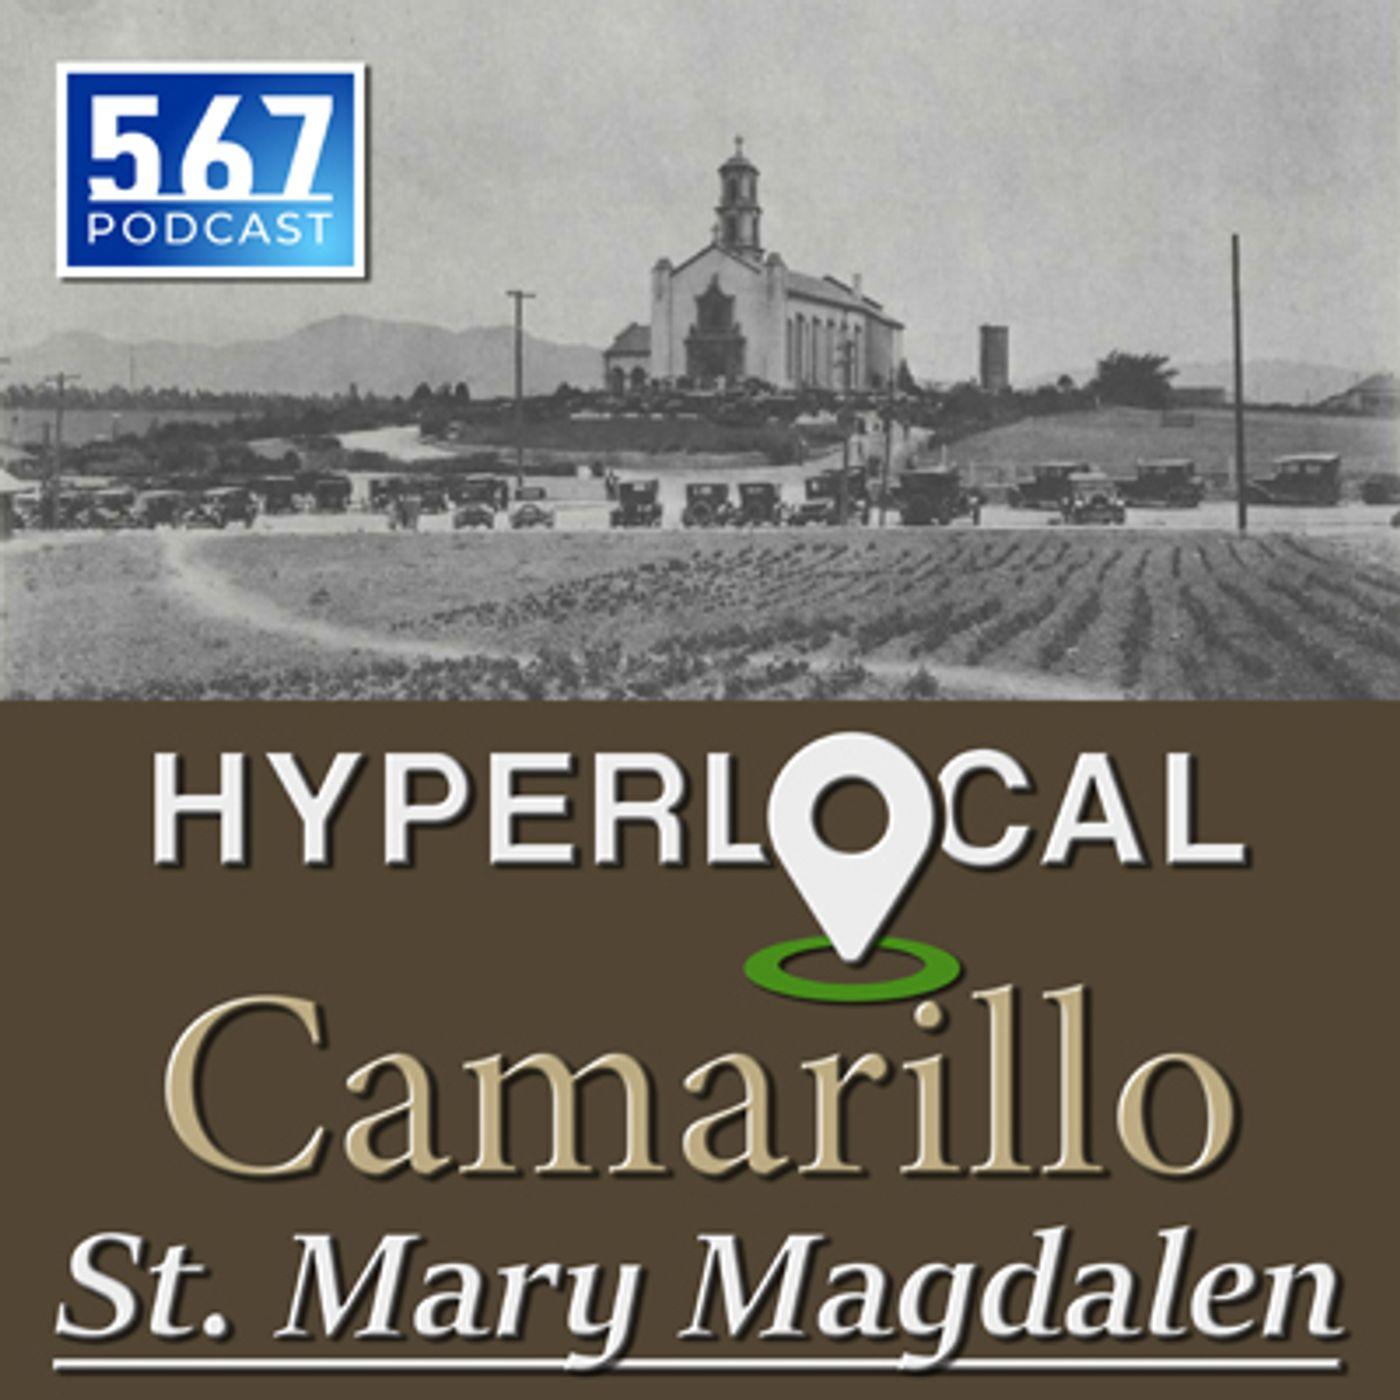 Saint Mary Magdalen Chapel: Juan Camarillo's Legacy